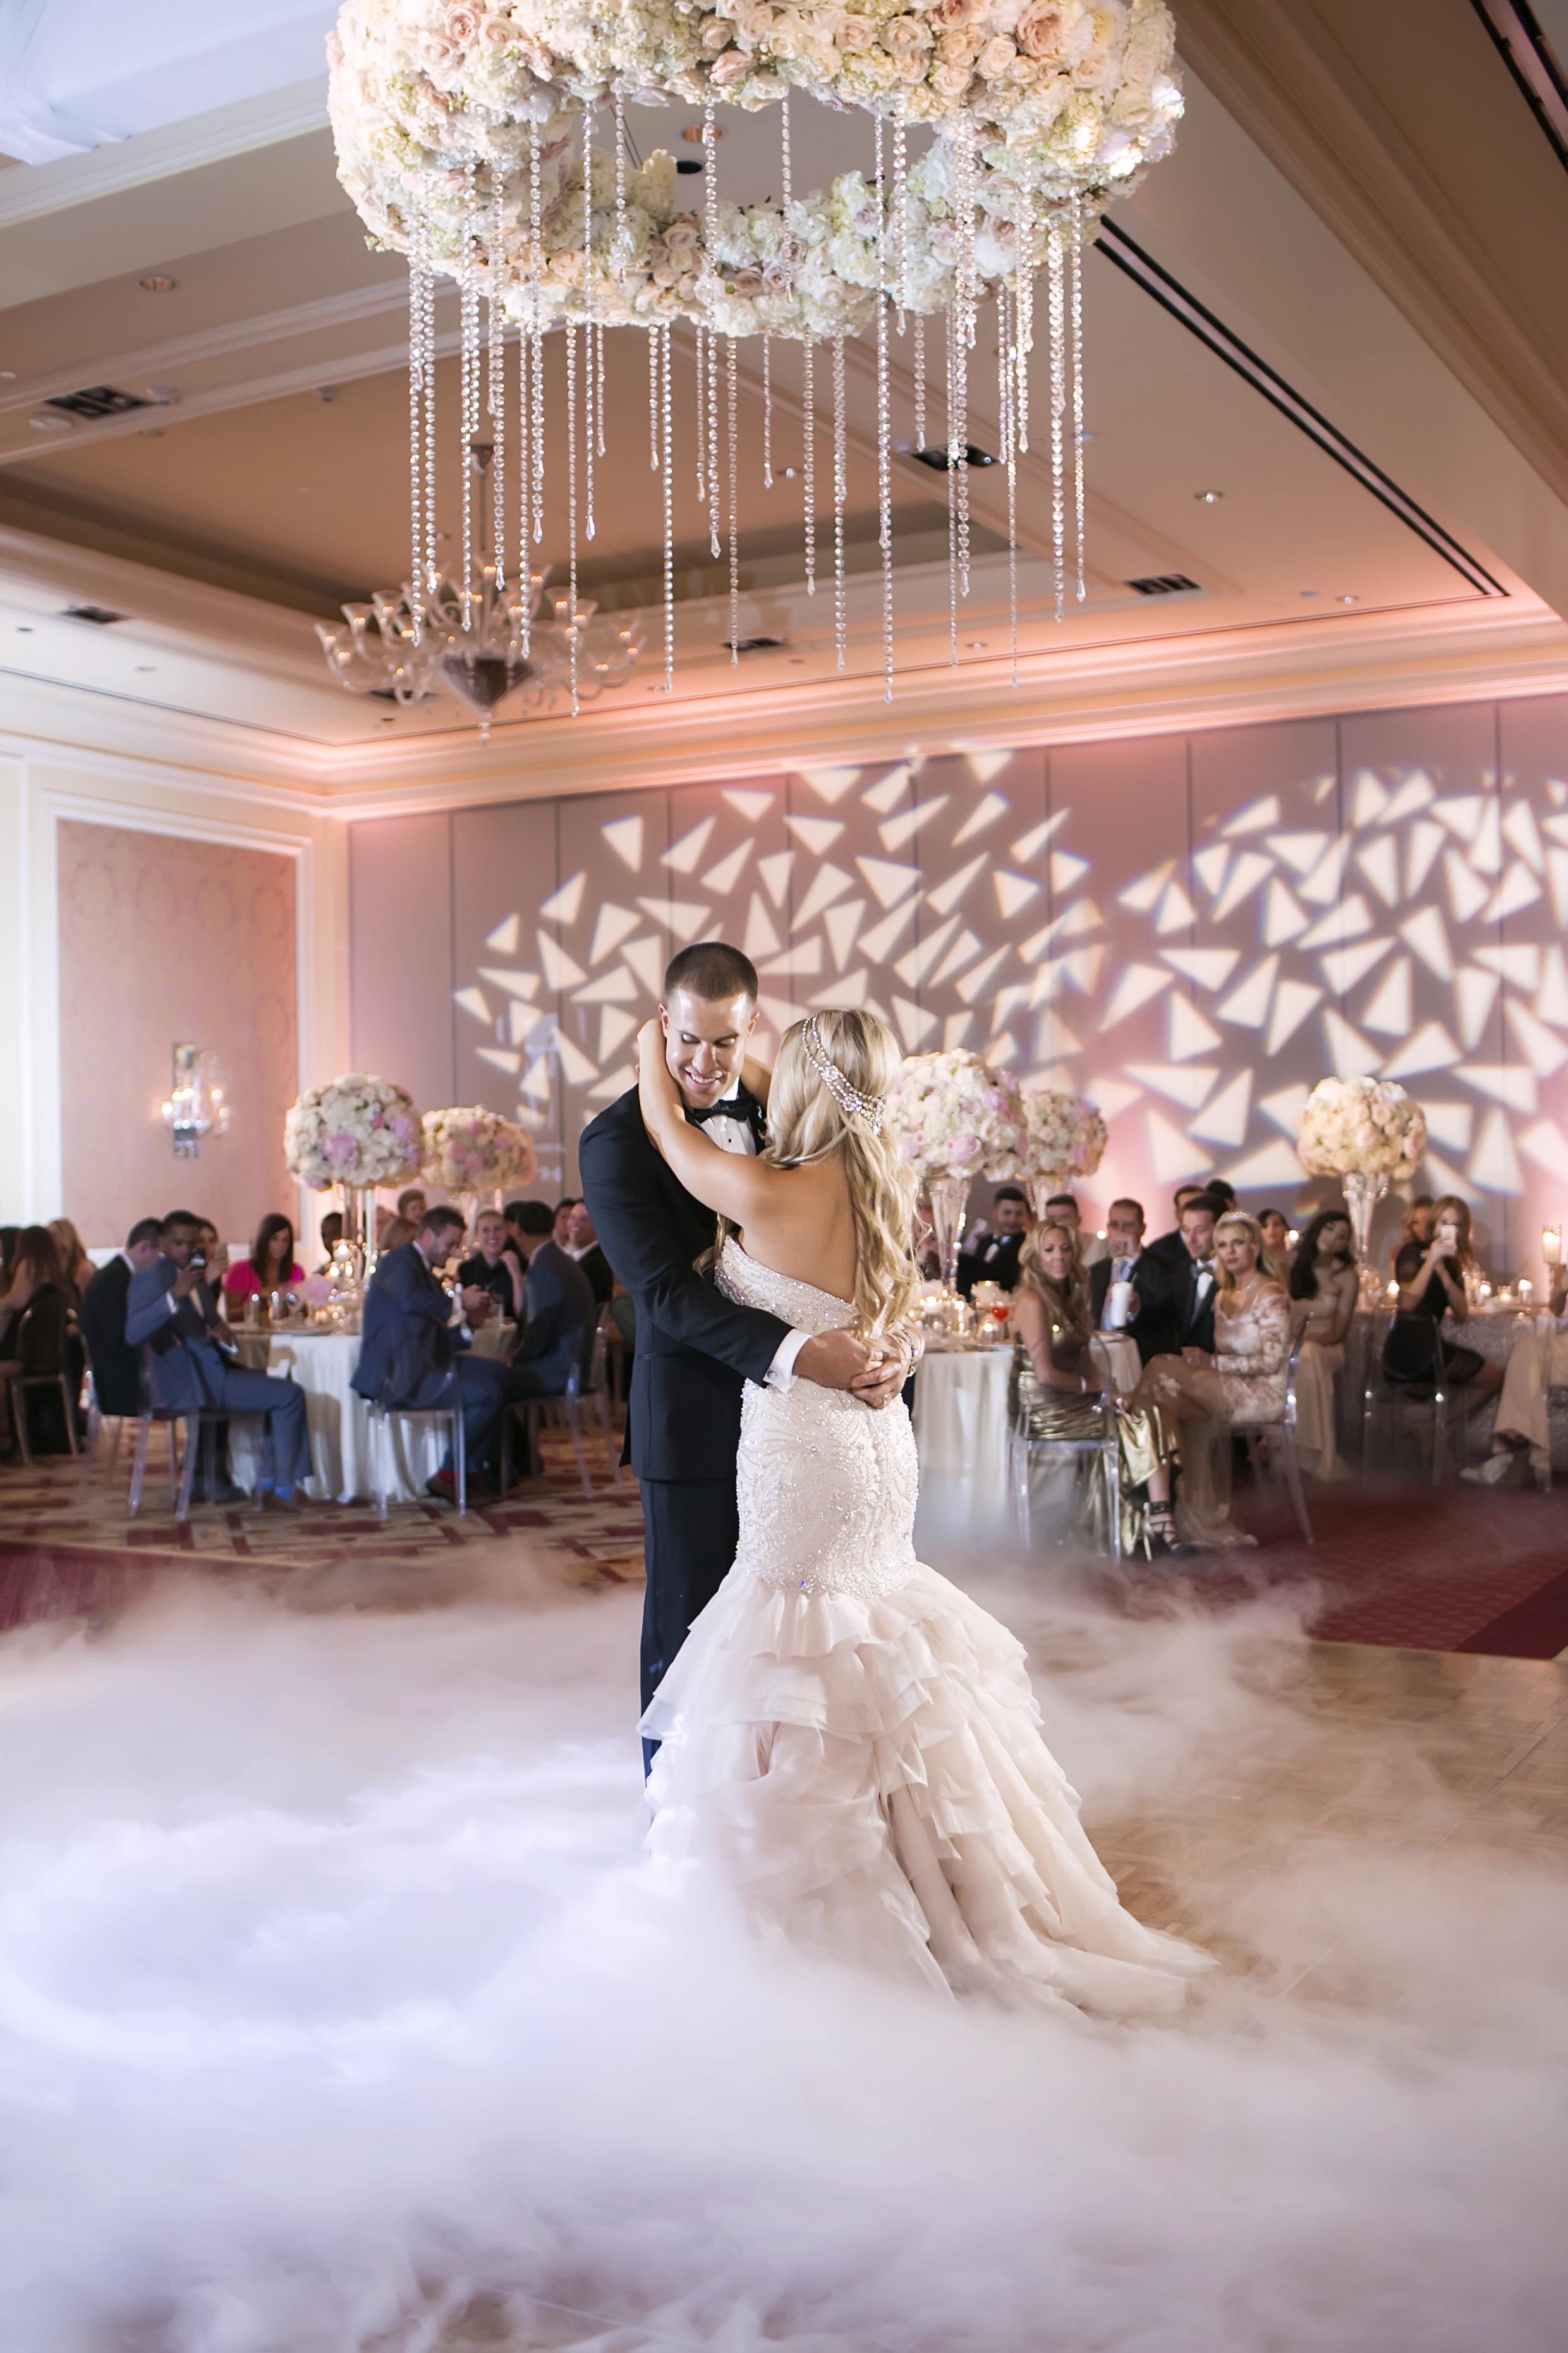 Brittany & Jason's Romantic Wedding - Posh Floral Designs